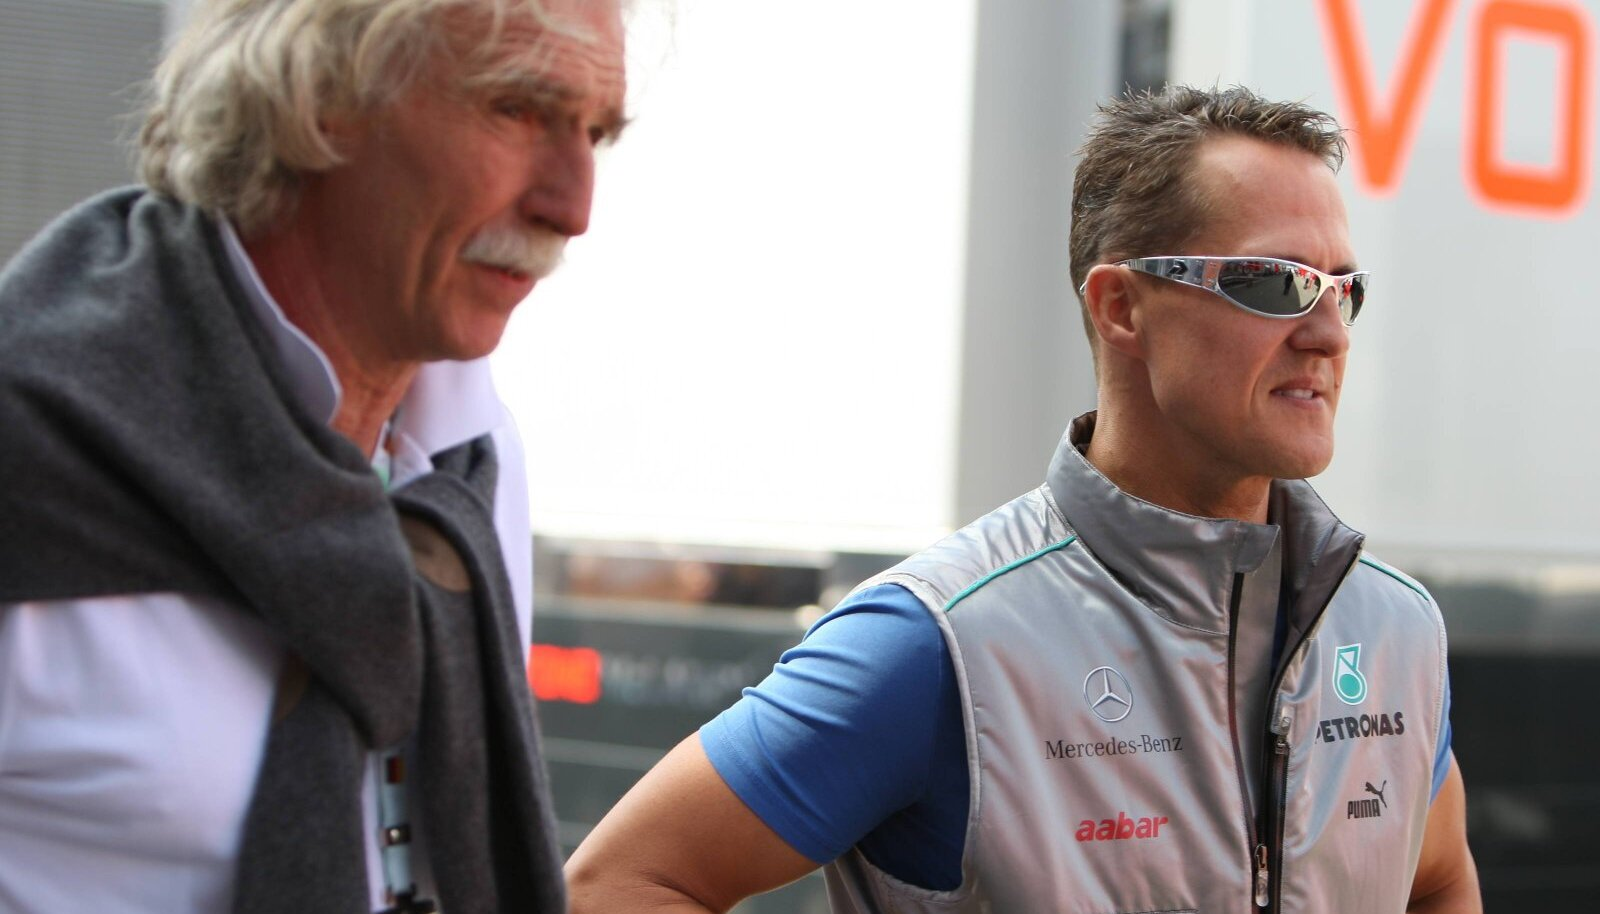 Johannes Peil ja Michael Schumacher